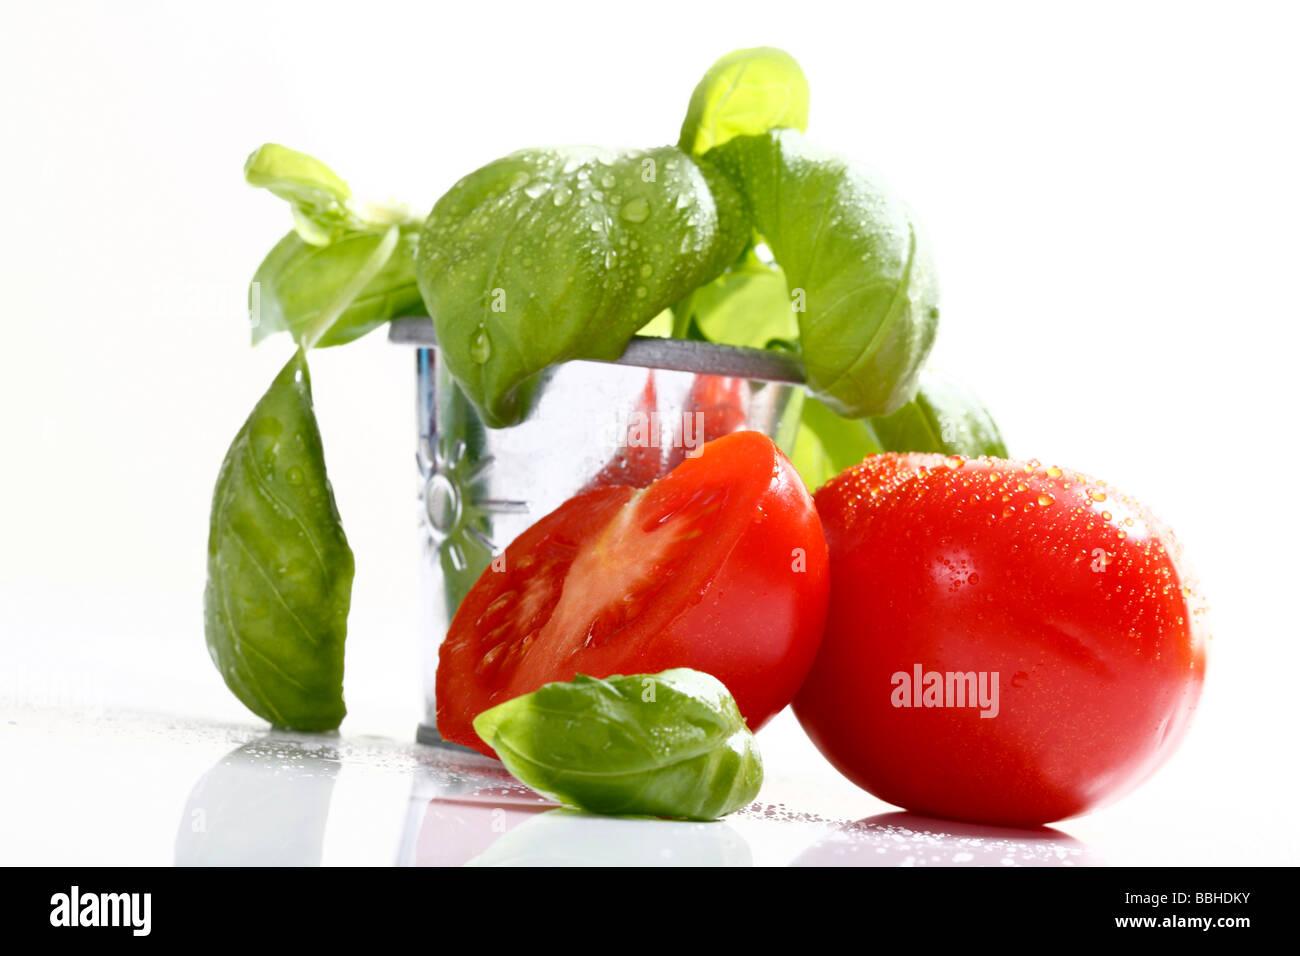 Tomatoes and basil Stock Photo